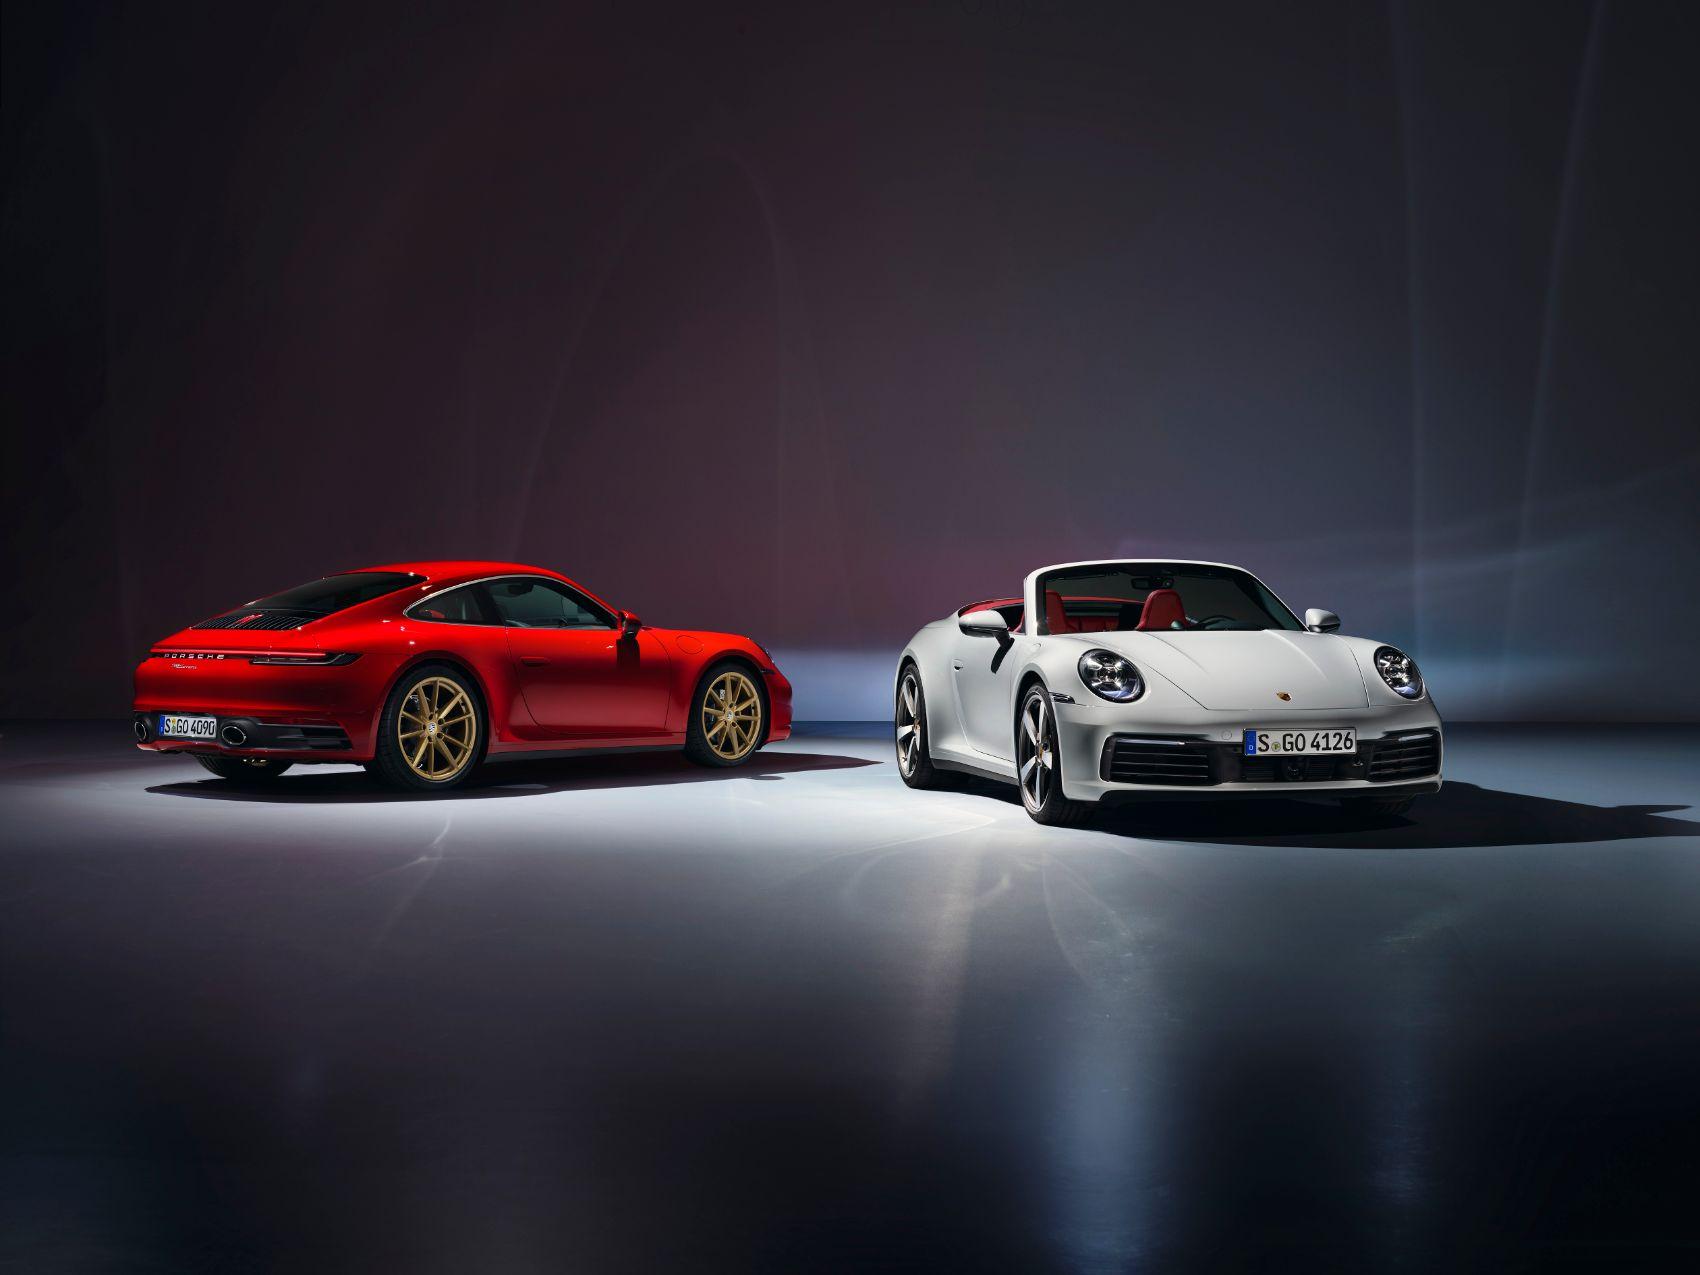 2020 Porsche 911 Carrera & 911 Carrera Cabriolet: A Brief Walk Around